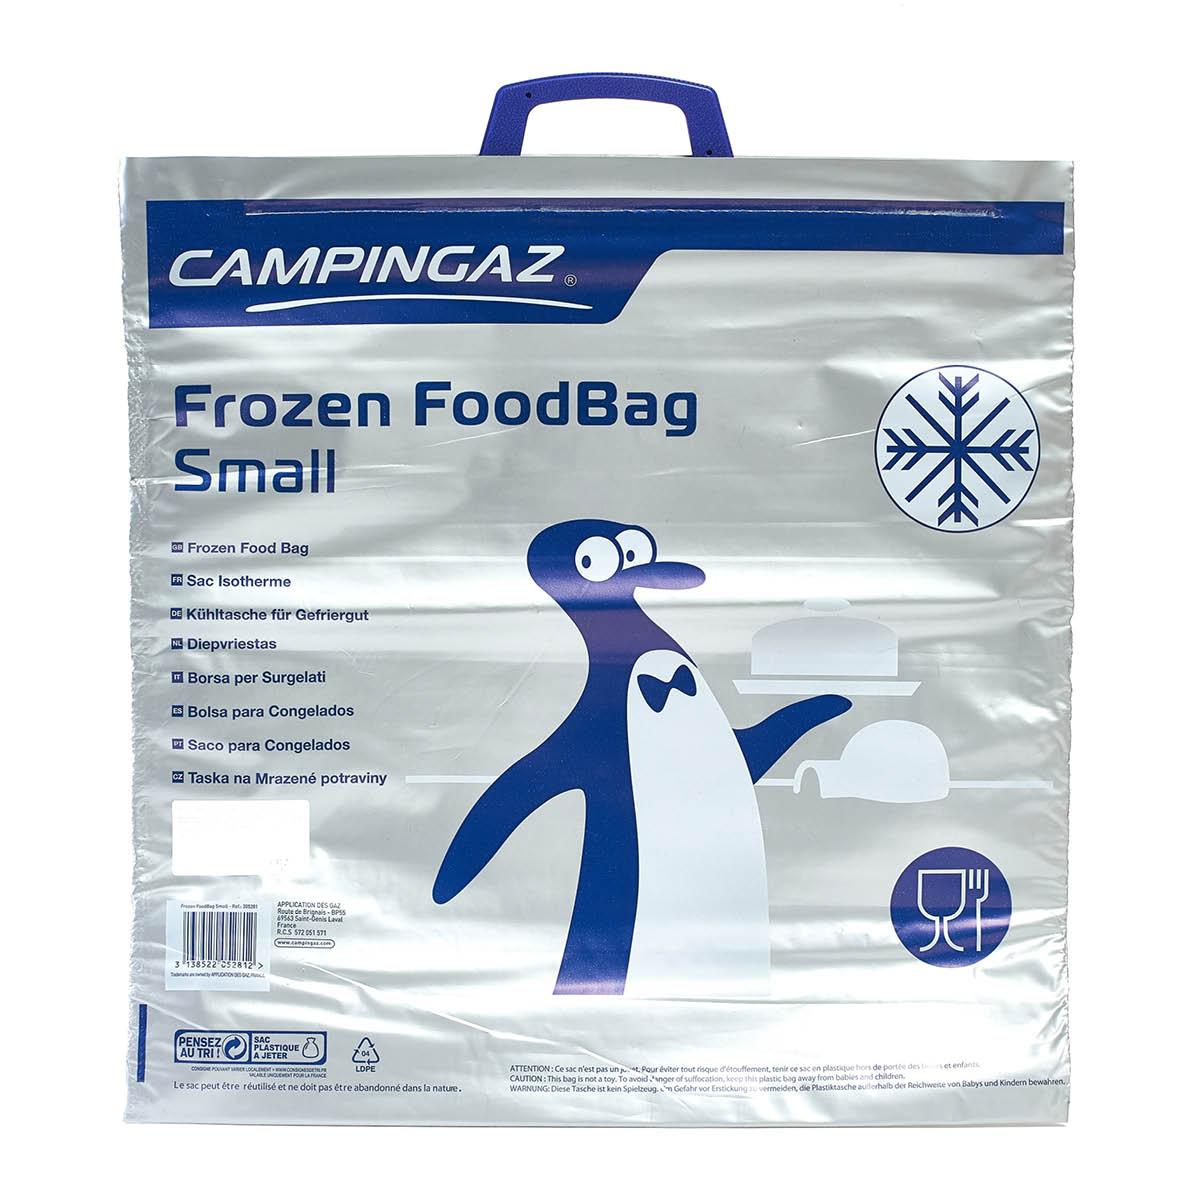 Frozen Foodbag Small